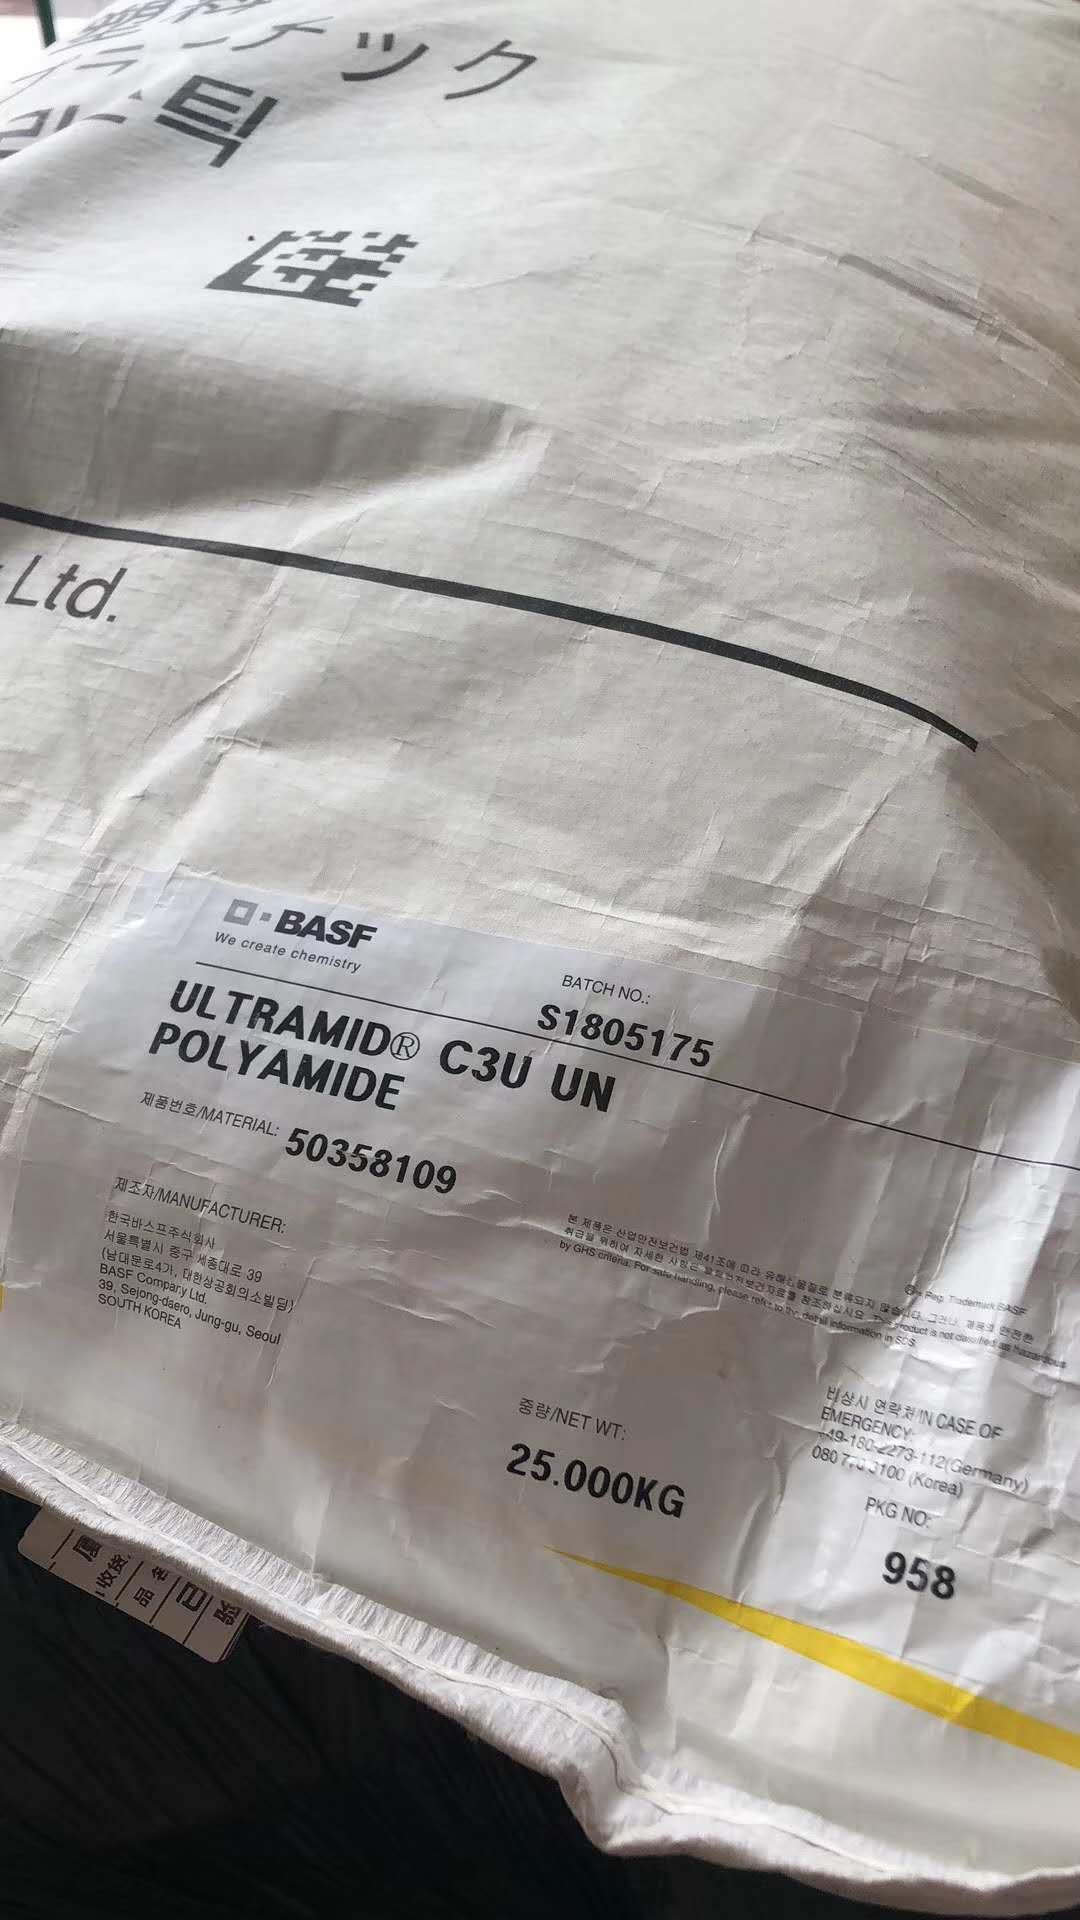 Ultramid C3U